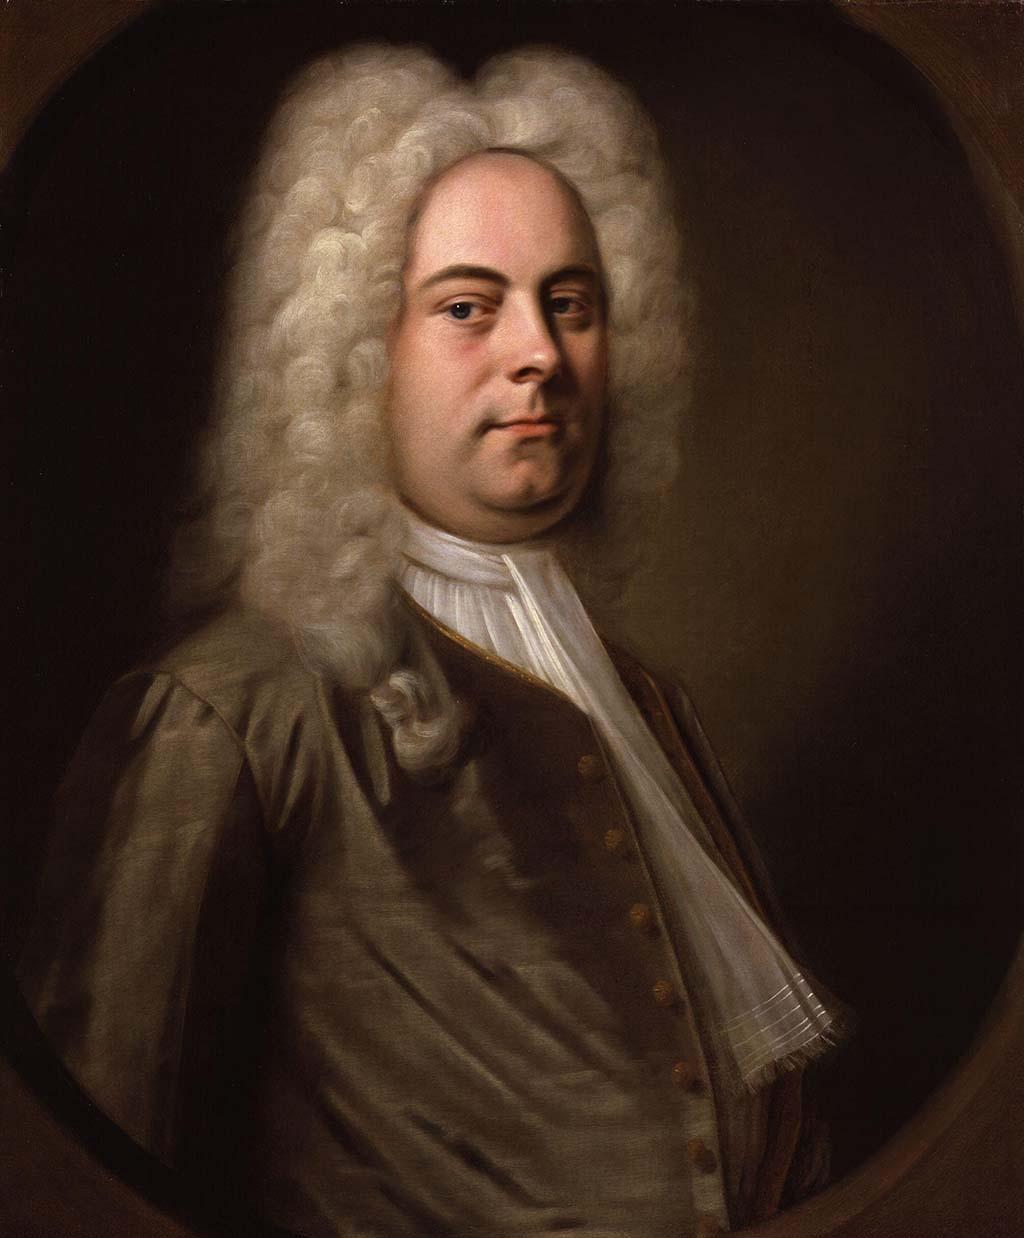 Händel